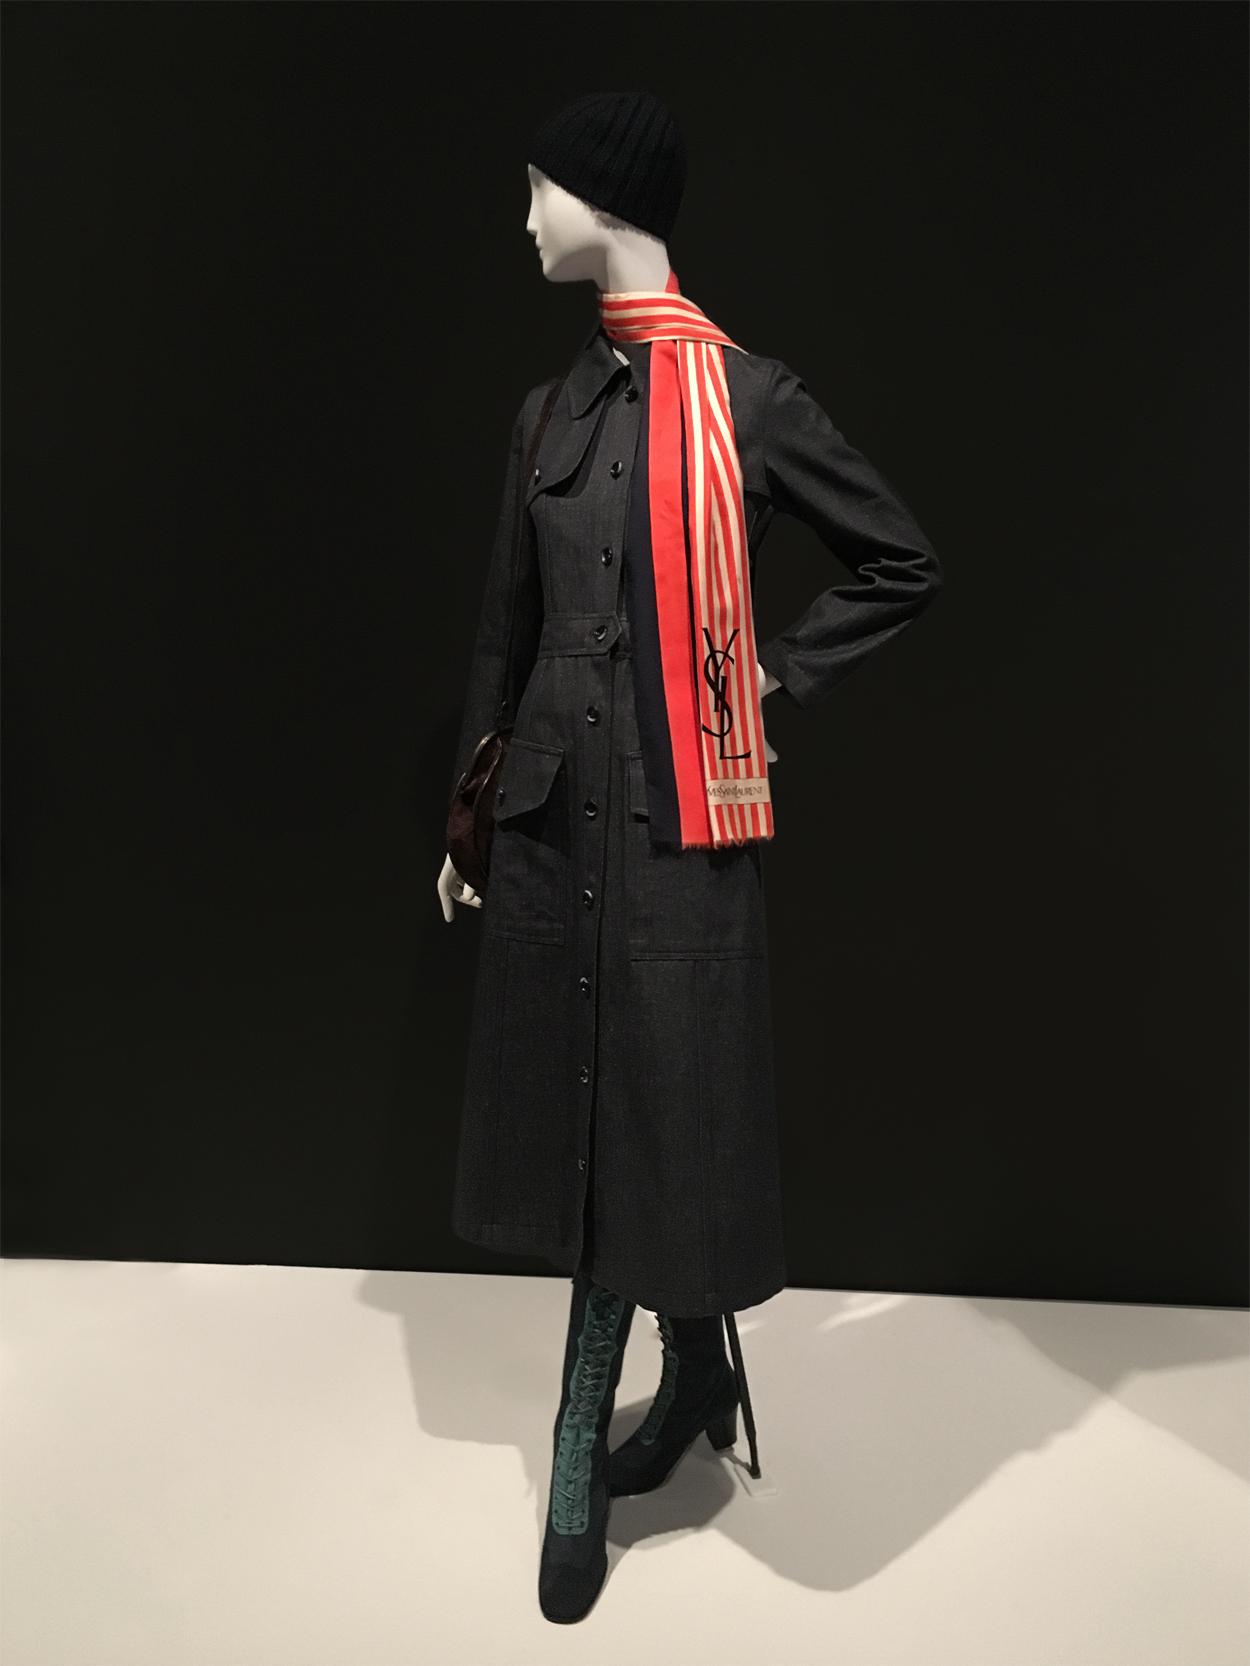 YSL-exhibit-kennethtay-01